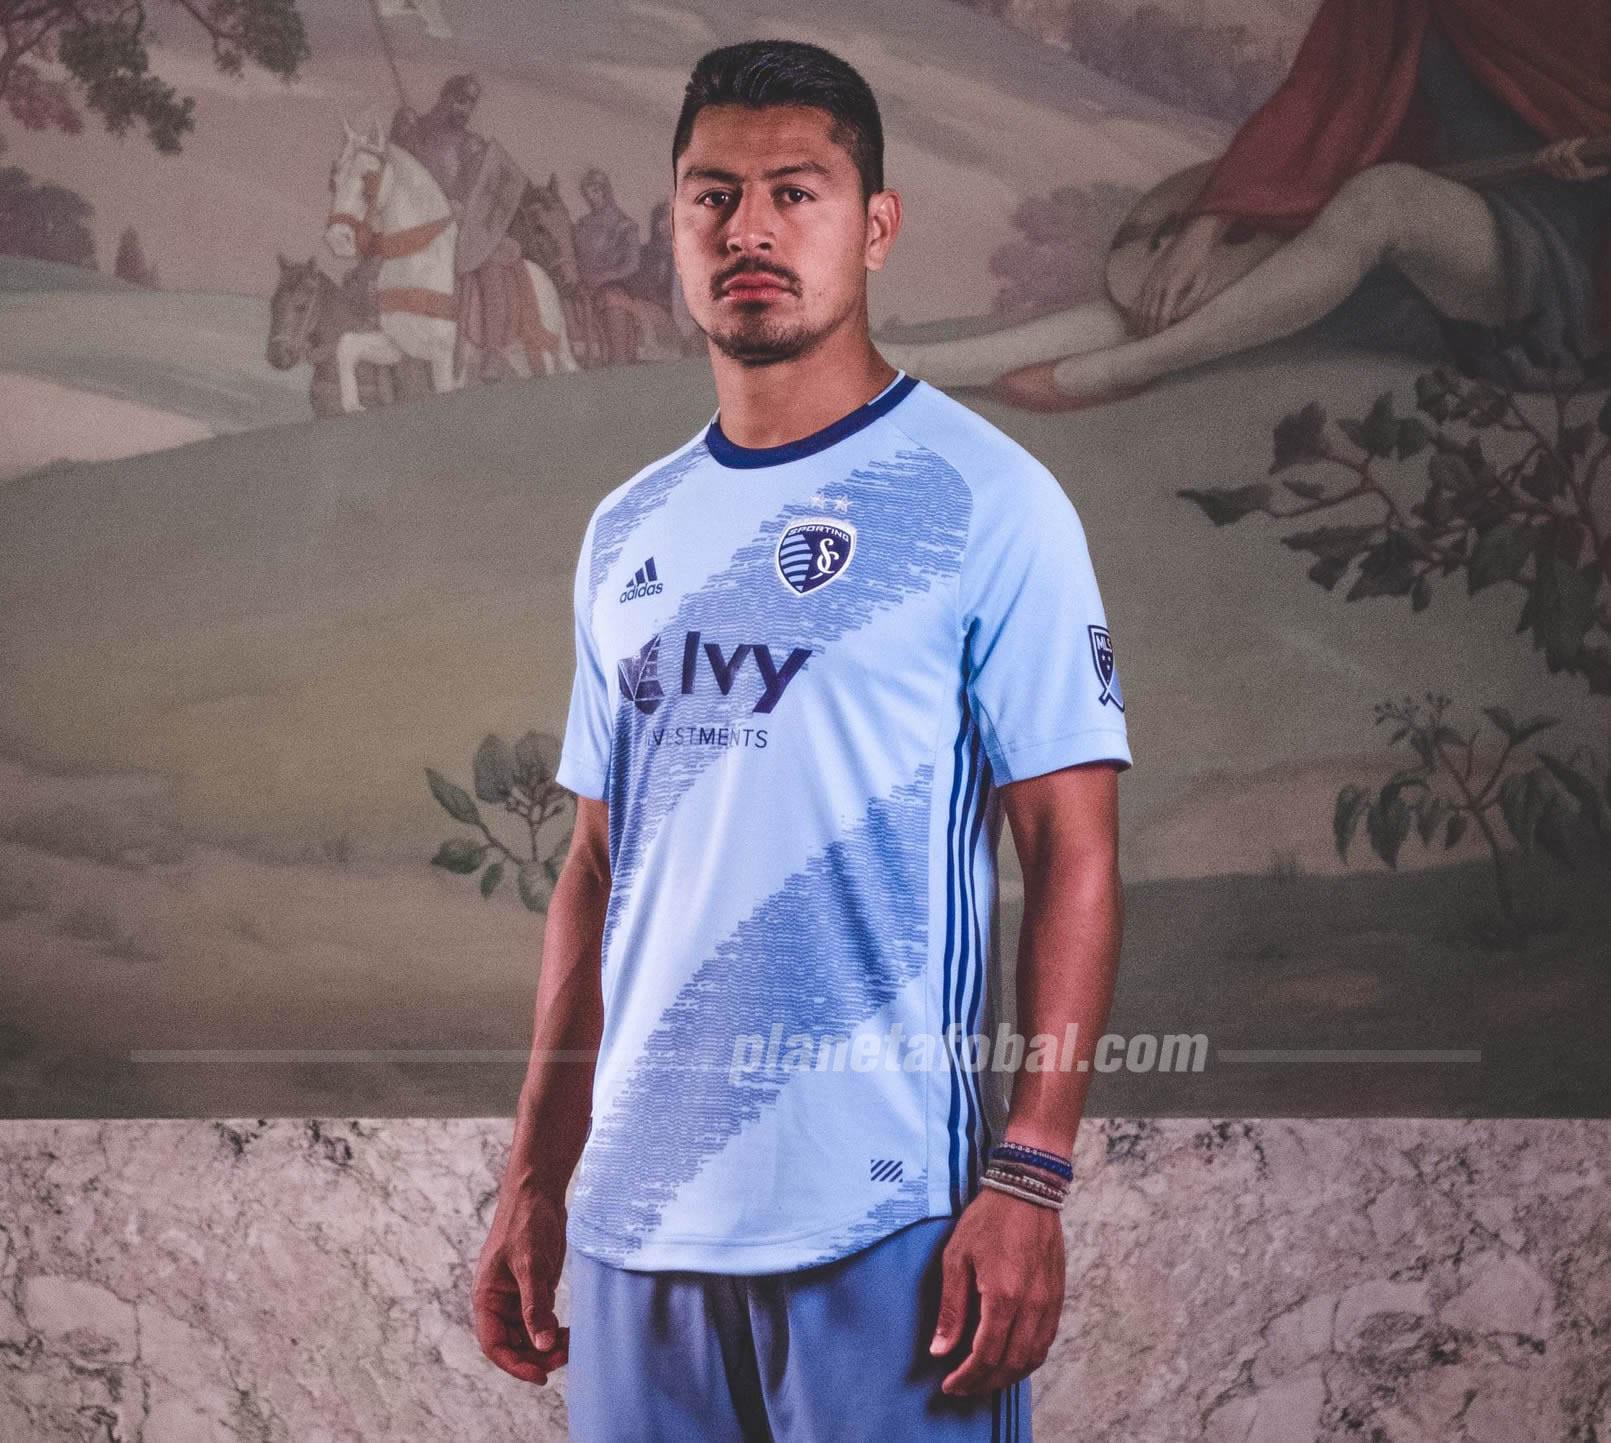 Camiseta titular Adidas del Sporting Kansas City 2019/20 | Imagen Web Oficial